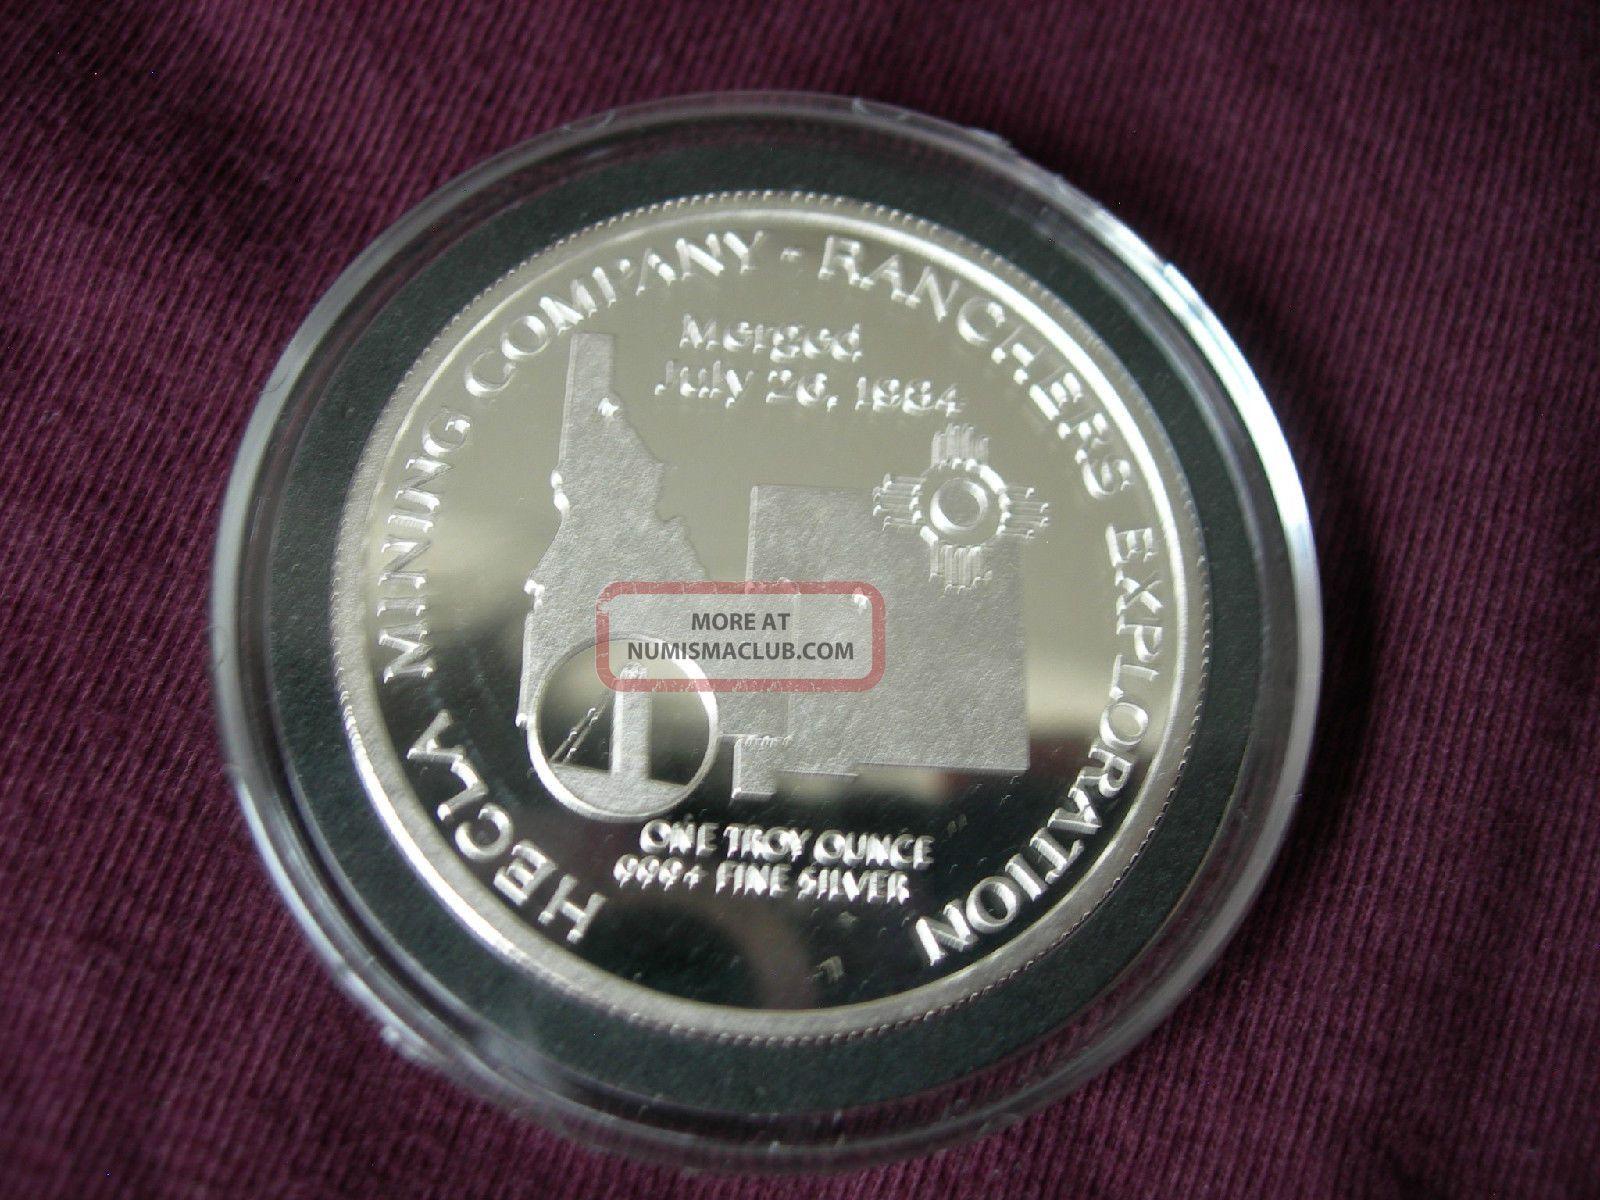 Rare 1985 Hecla Mining Company 1 Troy Ounce 999 Fine